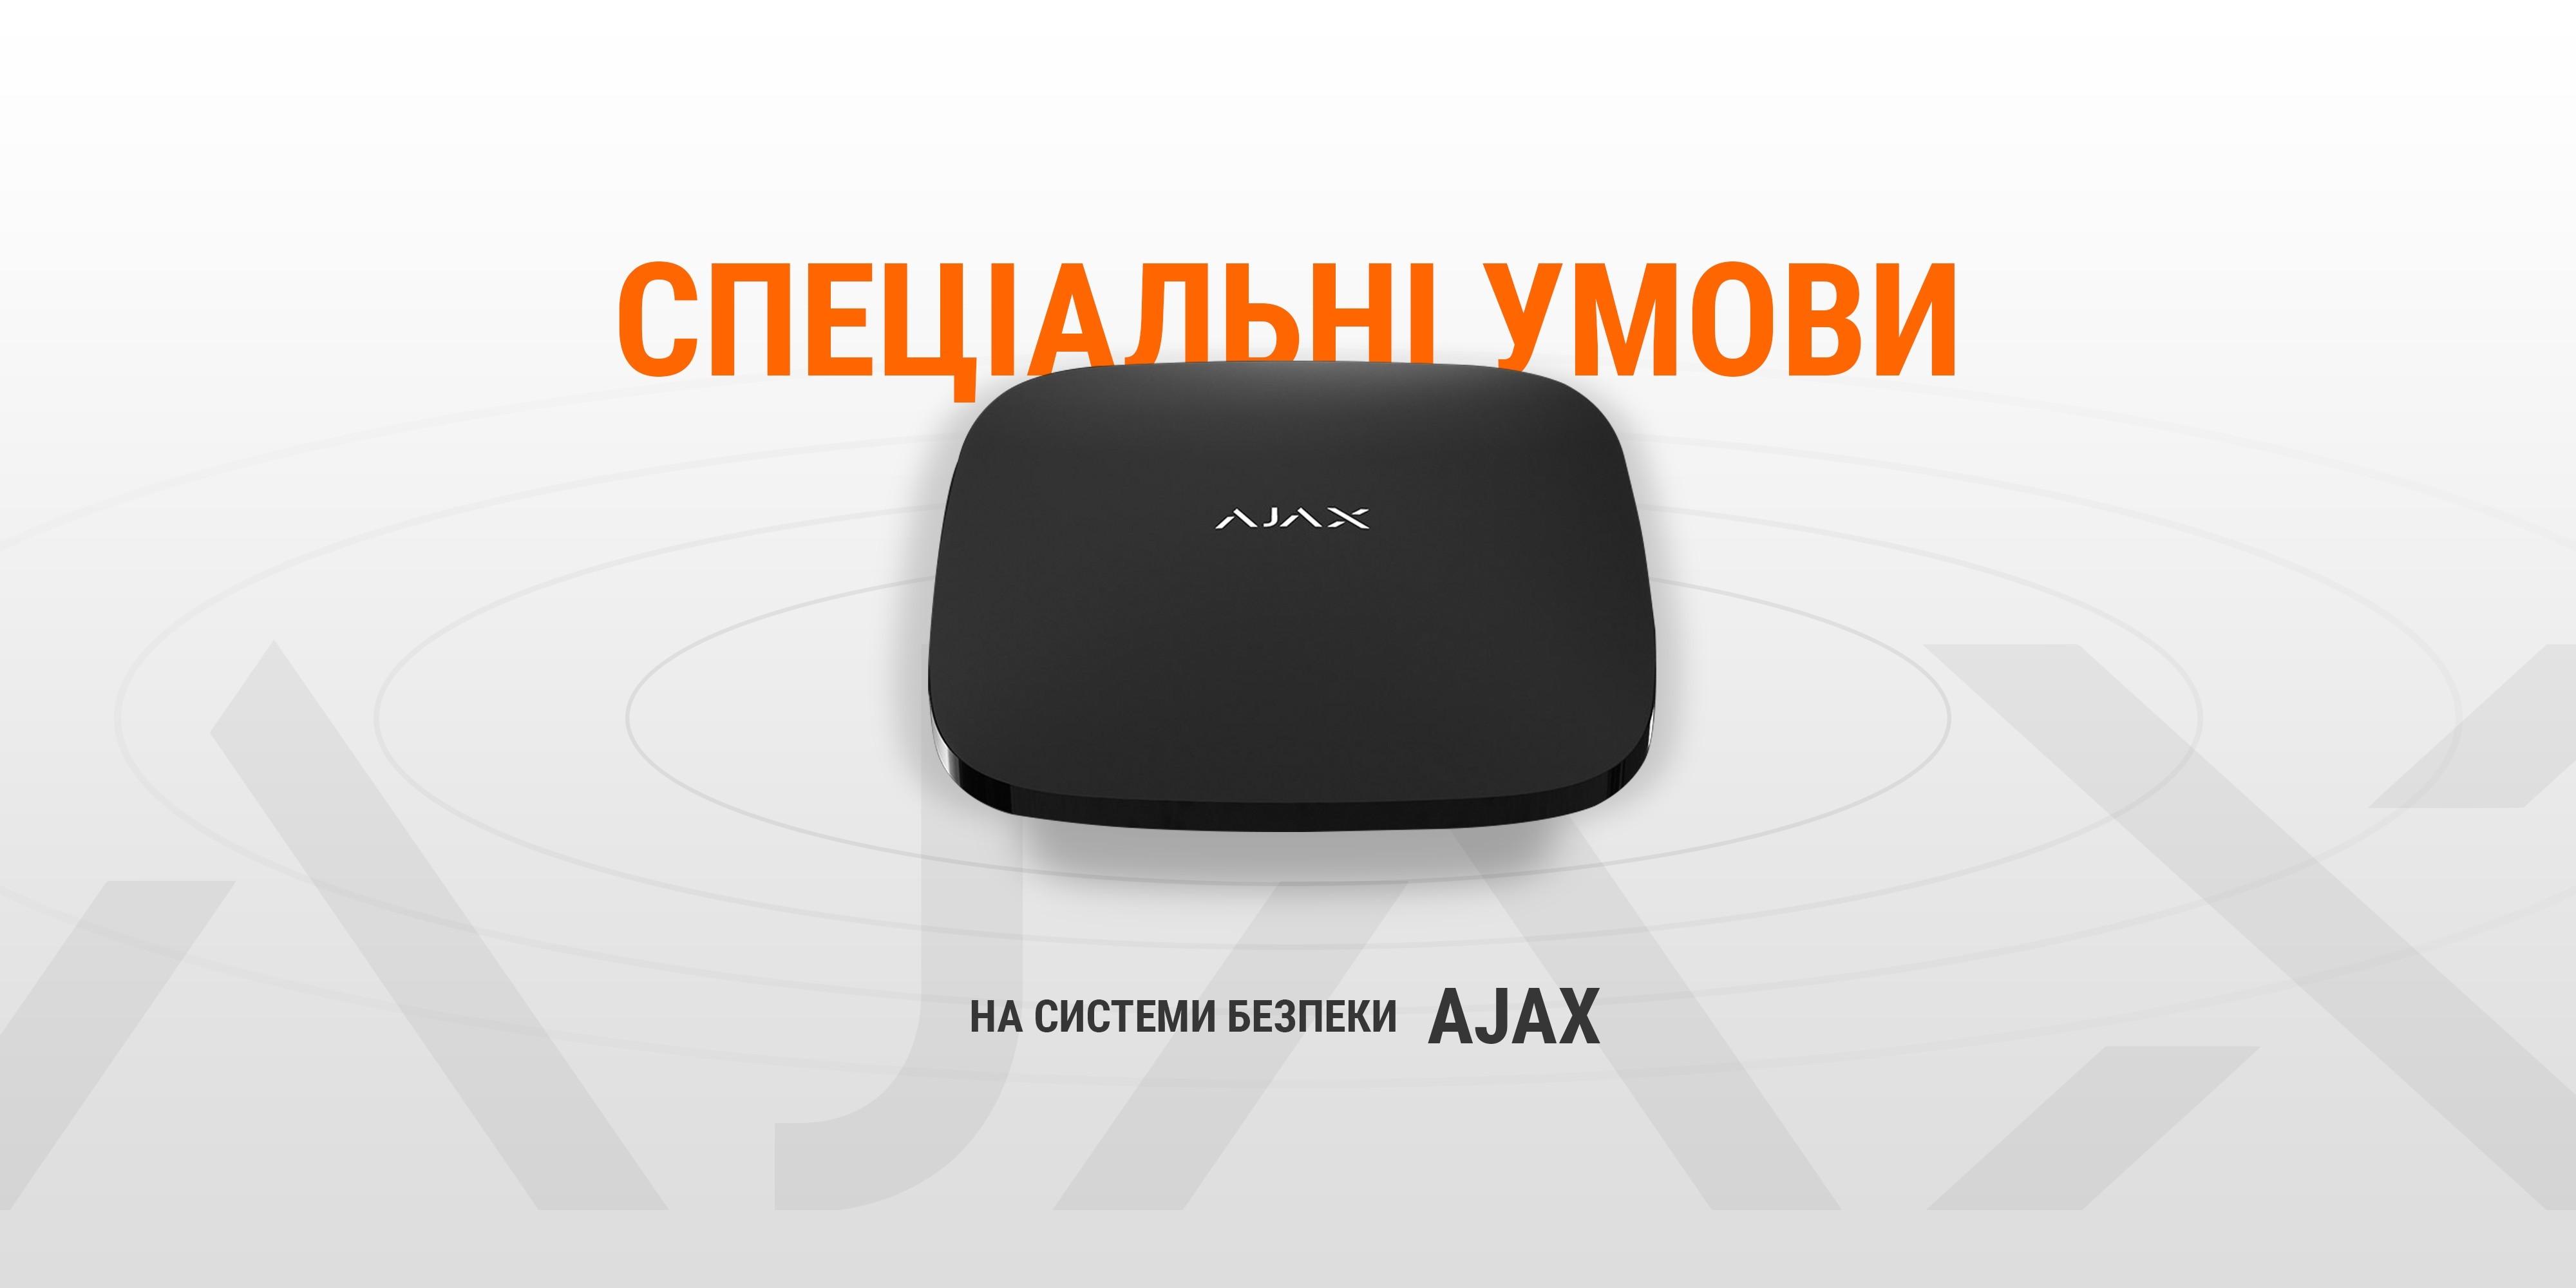 Standard One починає співпрацю з Ajax Systems